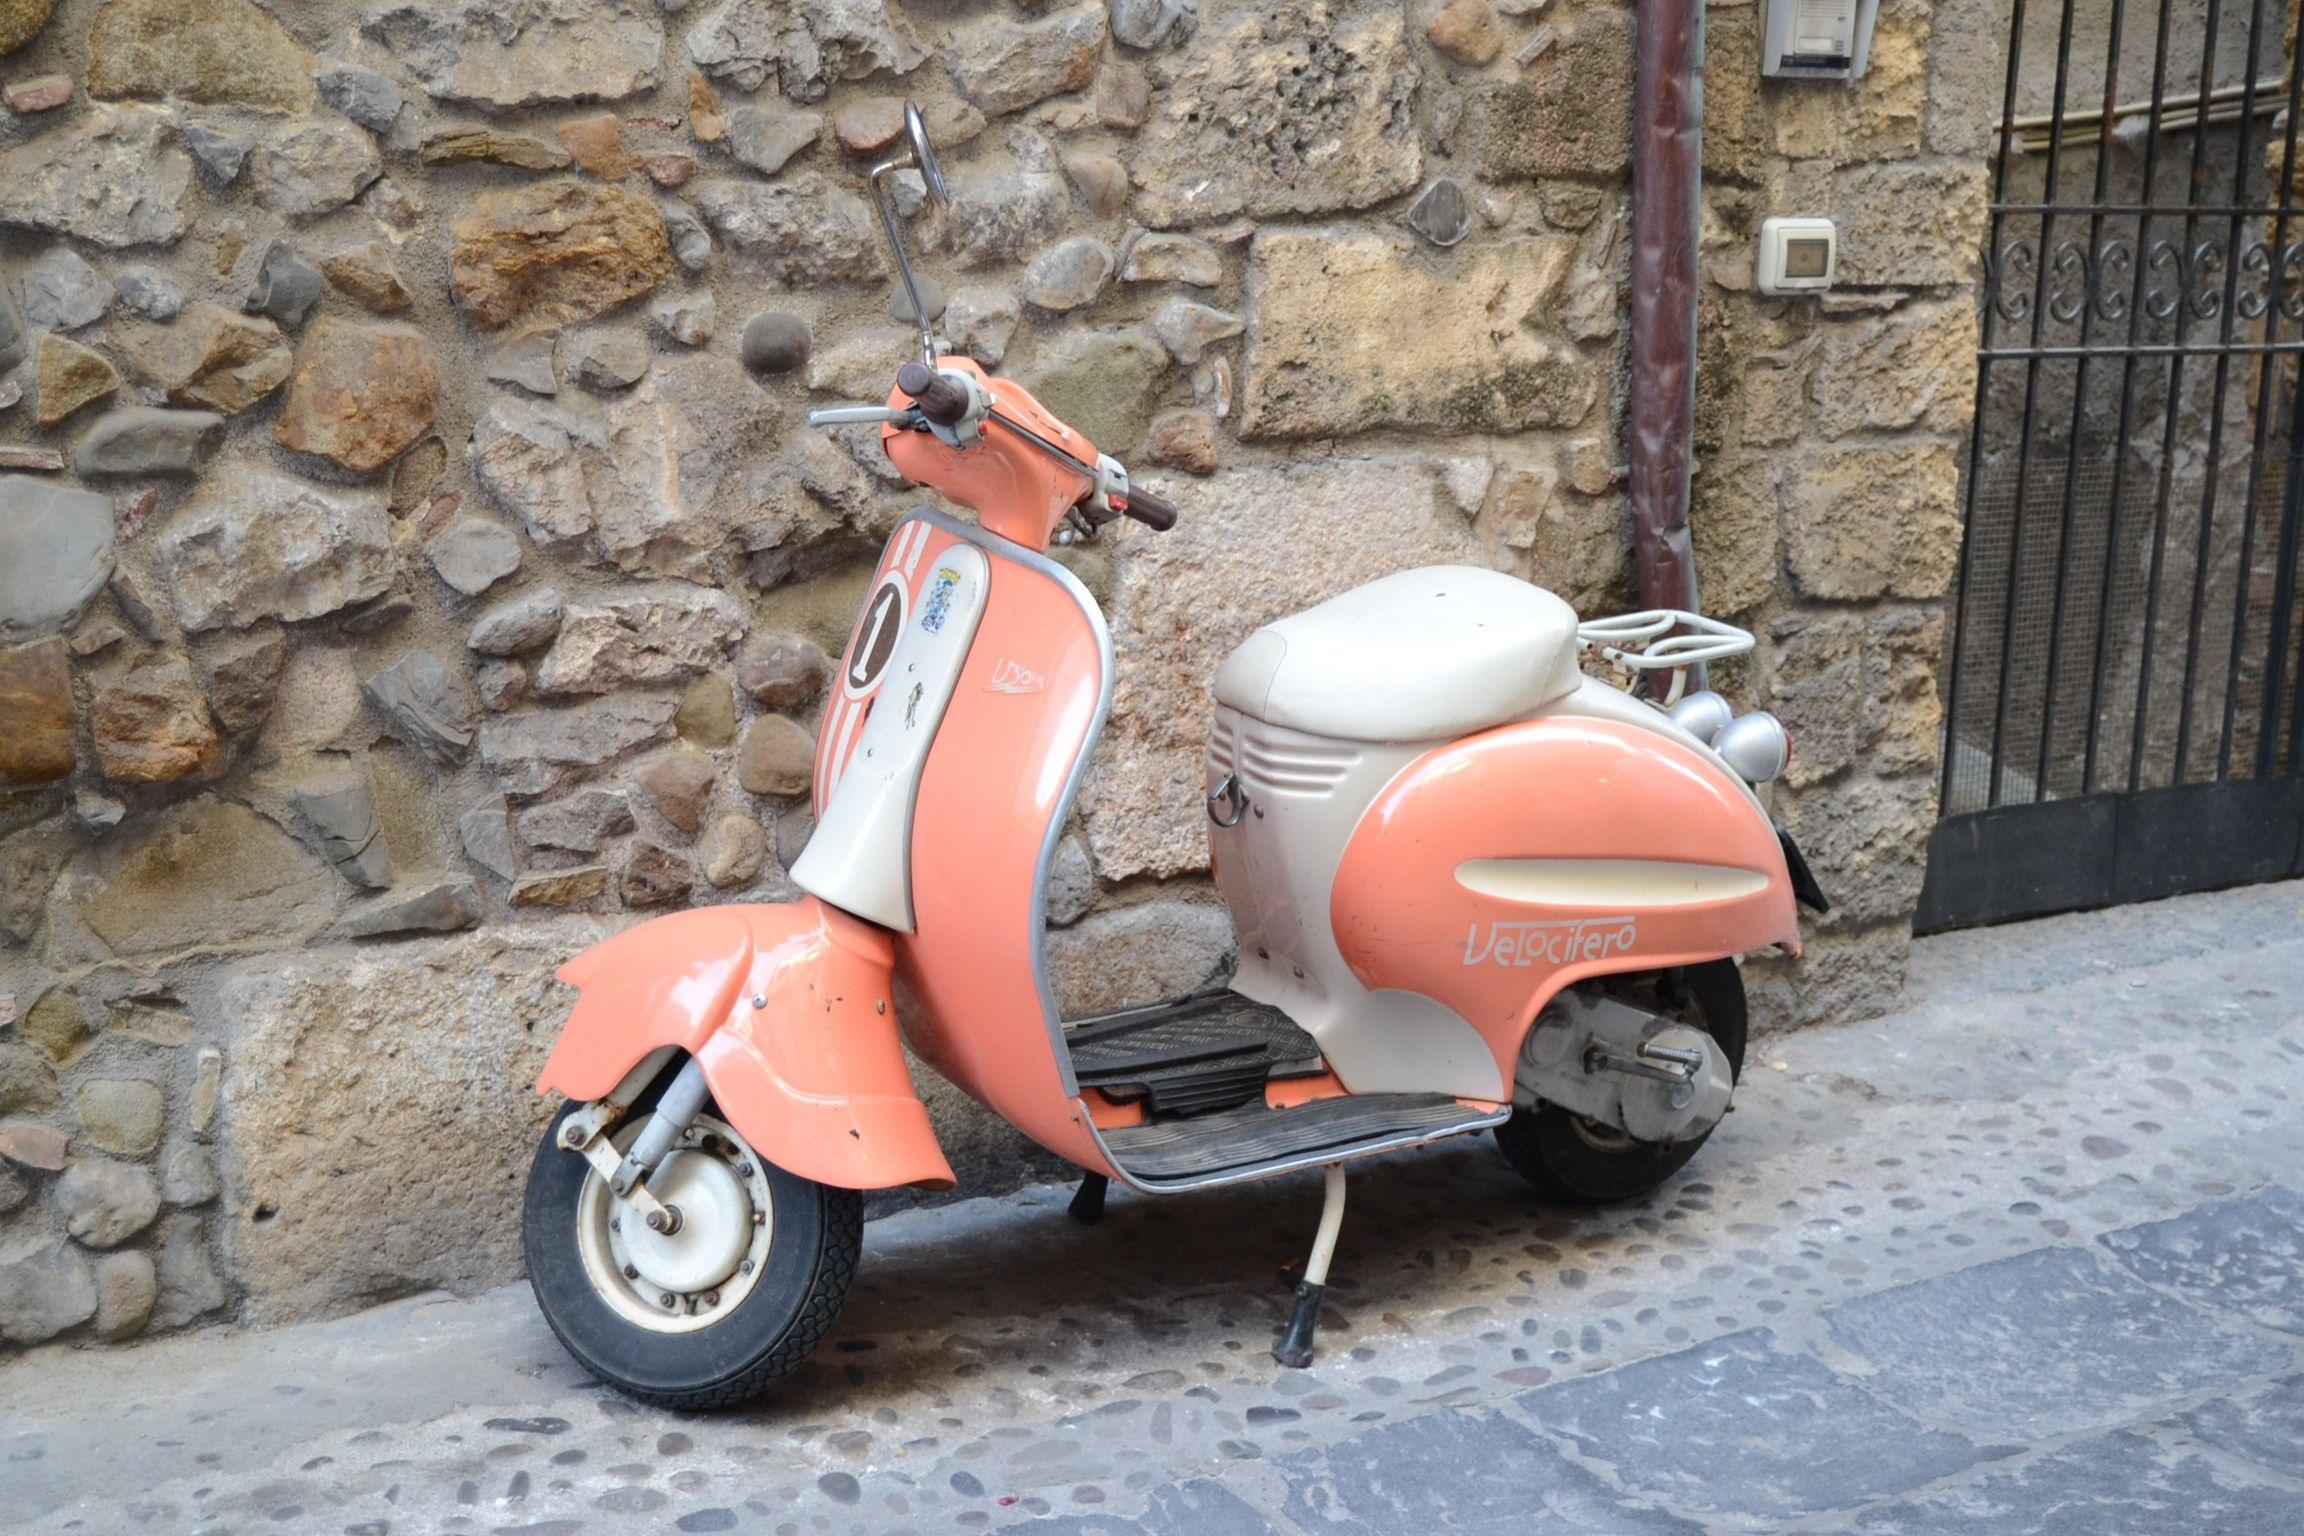 vintage italian scooter - HD2304×1536